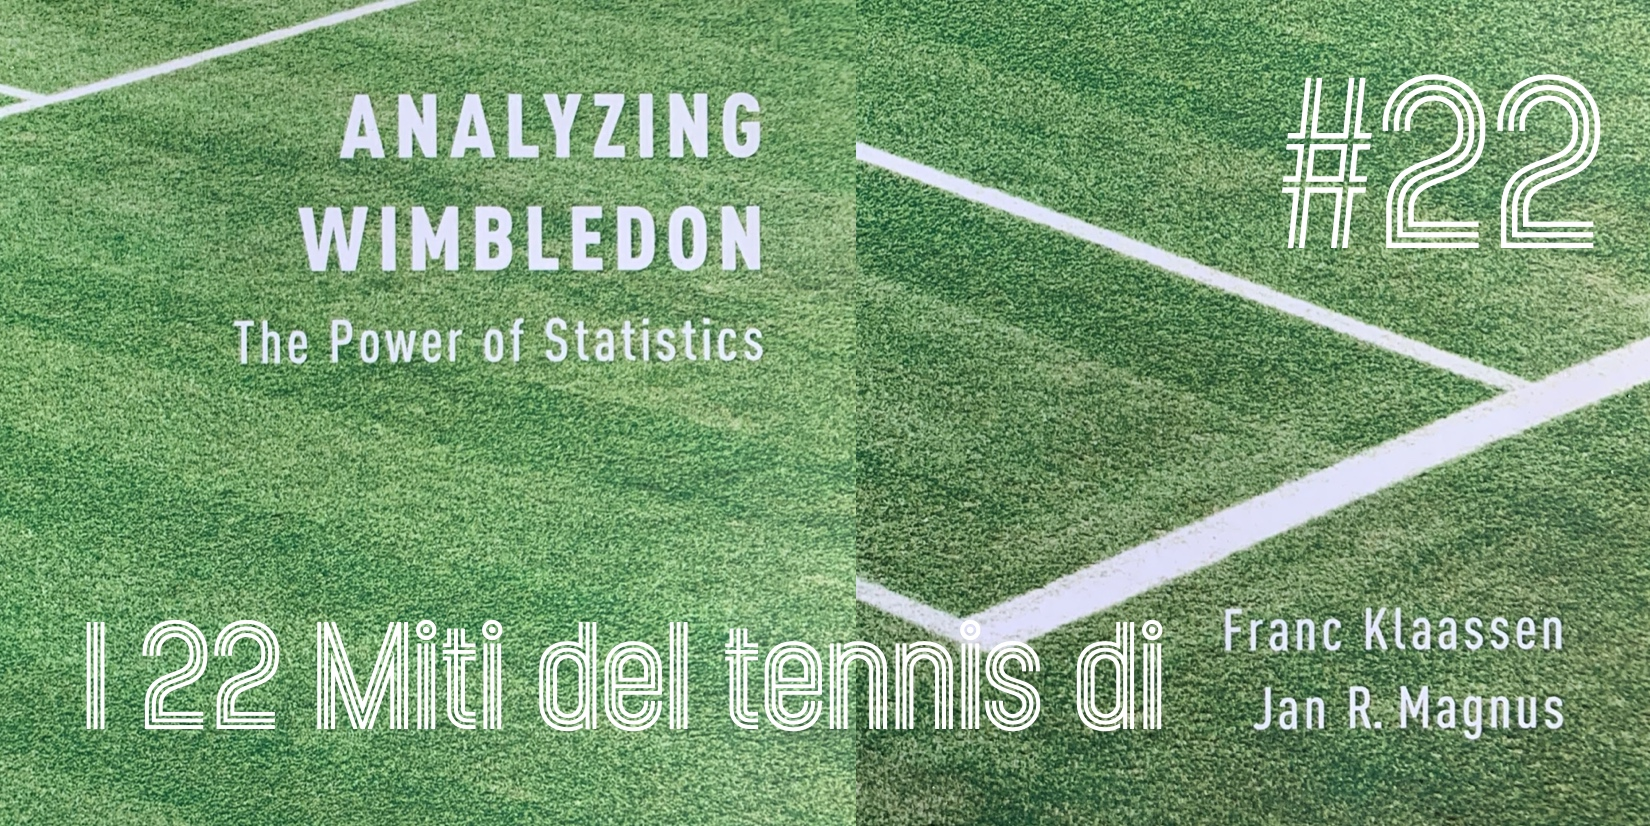 I 22 miti del tennis di Klaassen & Magnus – Mito 22 - settesei.it